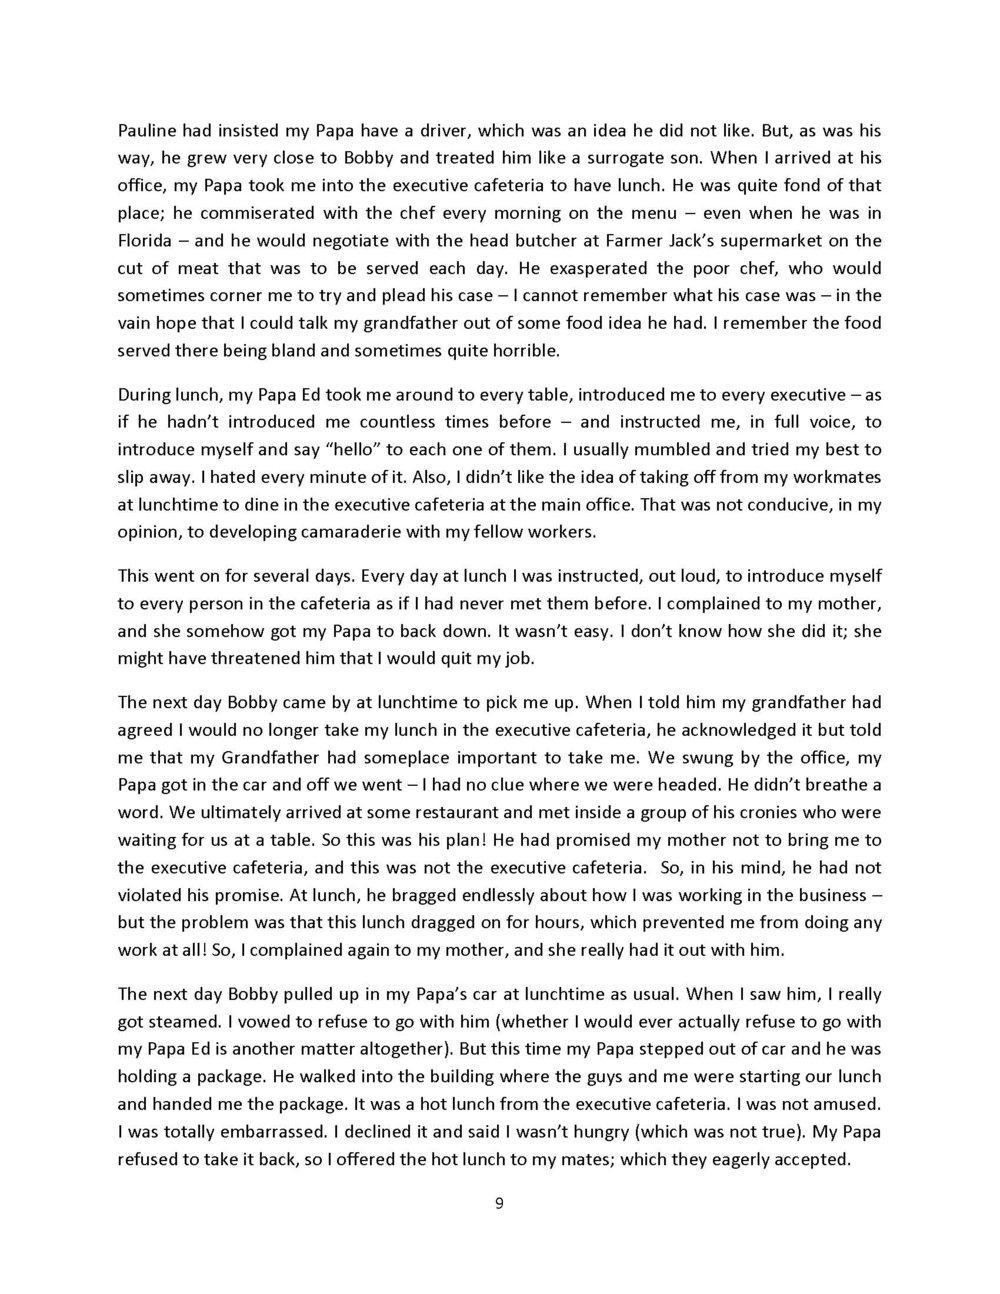 Papa Ed Stories -excerpts_Page_09.jpg